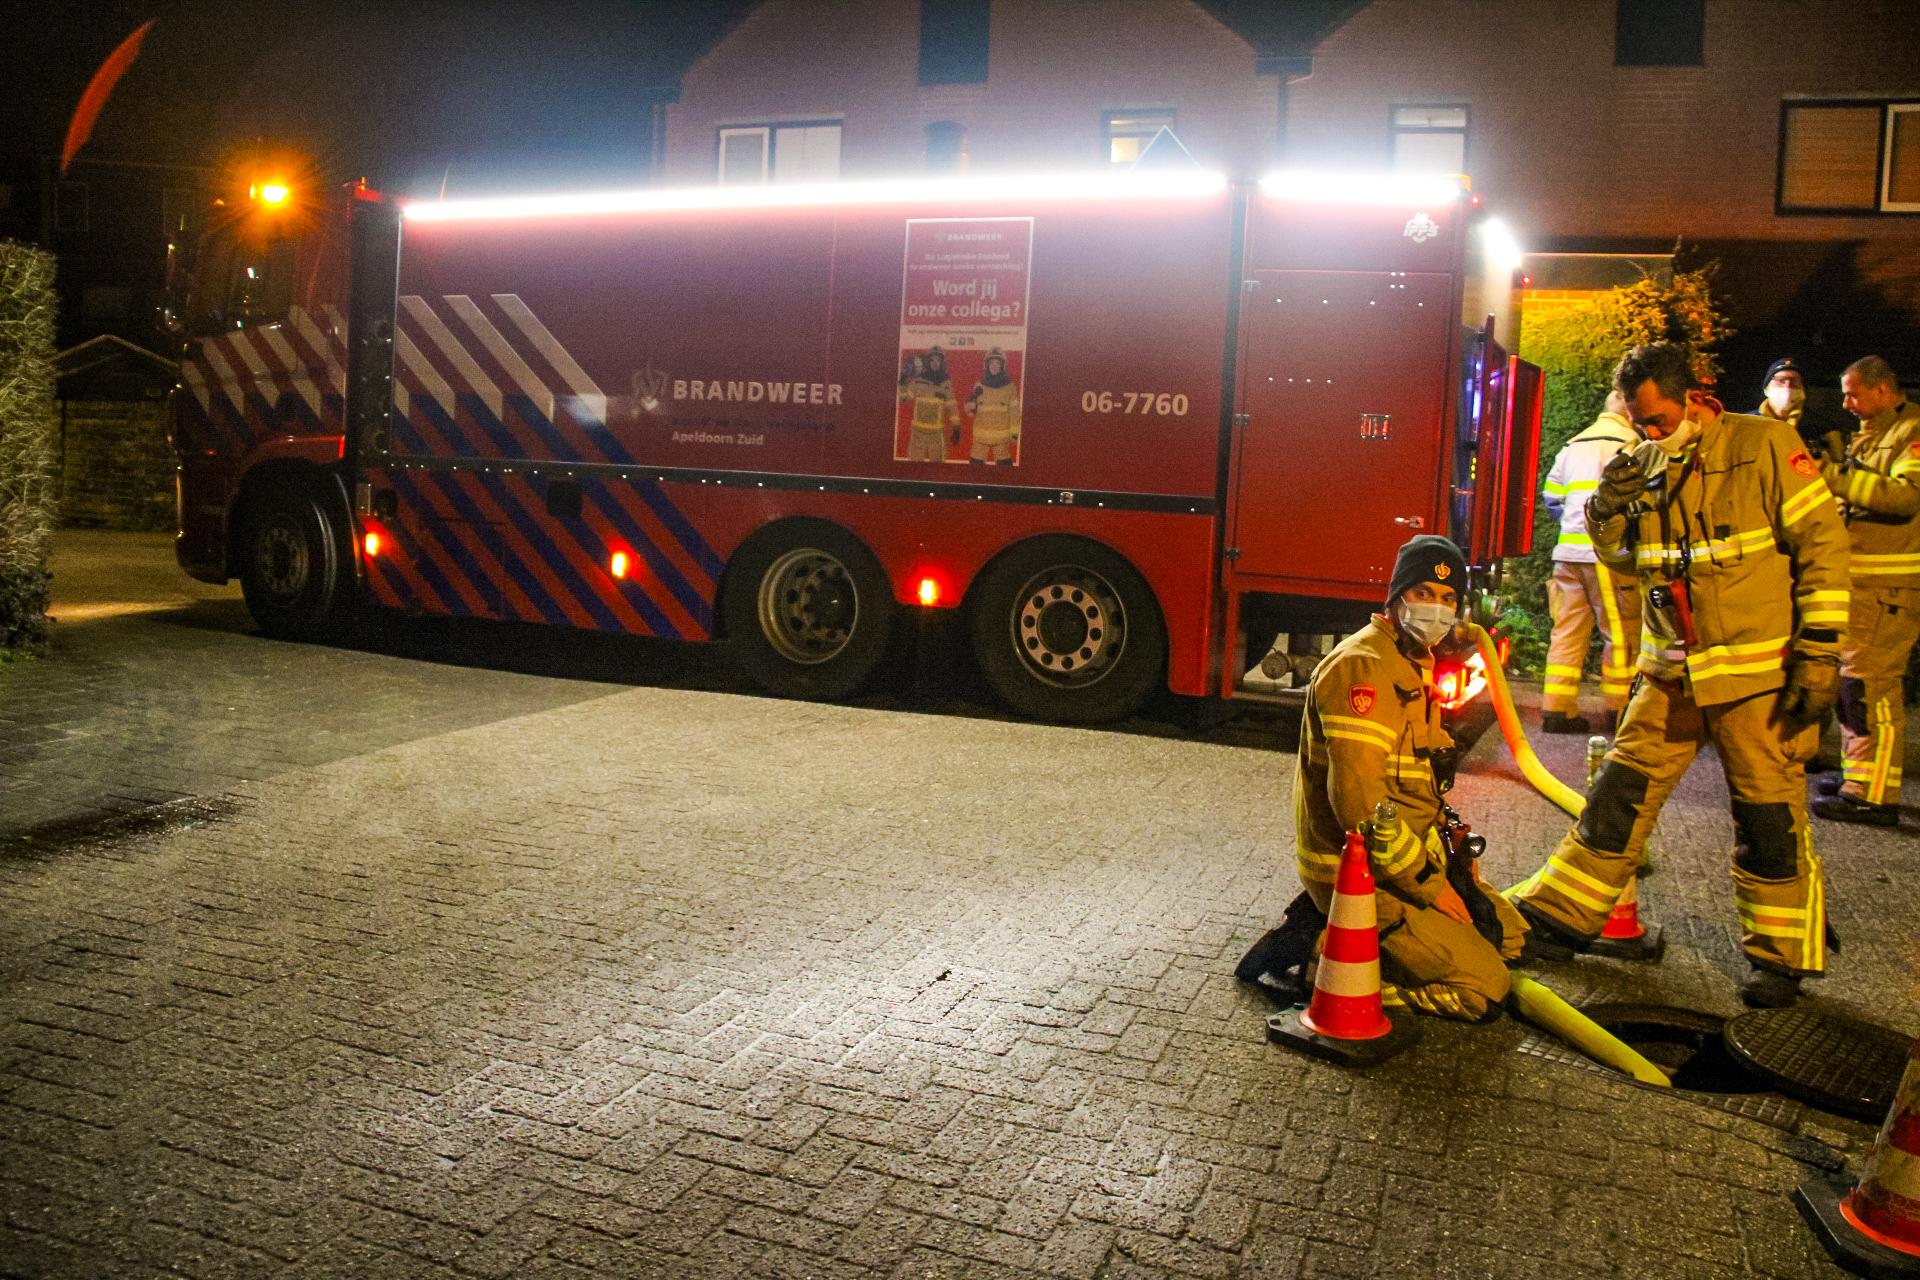 Brandweer spoelt riool na waarnemen 'vreemde' lucht